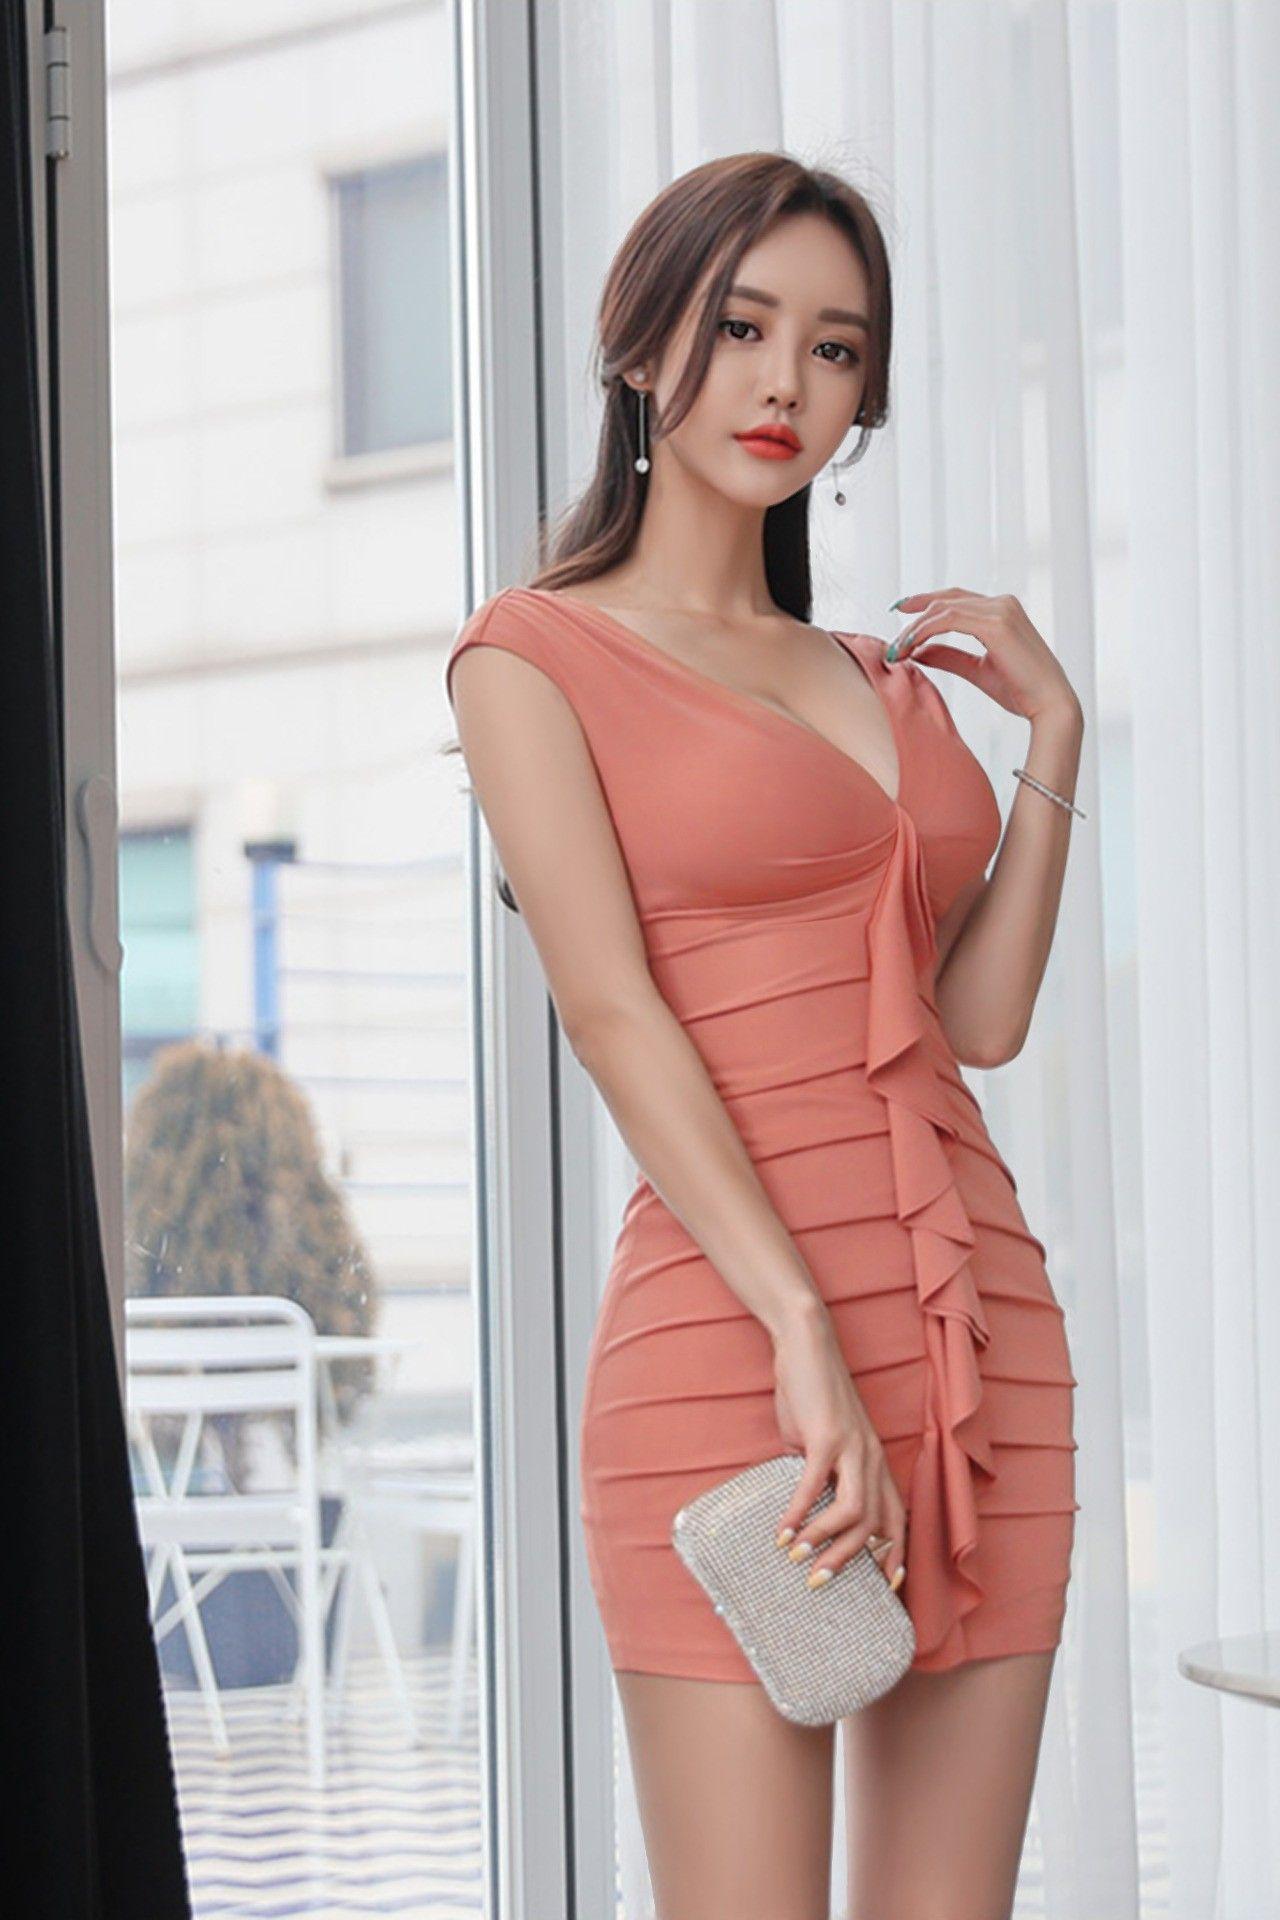 Roztomilý Ázijské Teen Sex